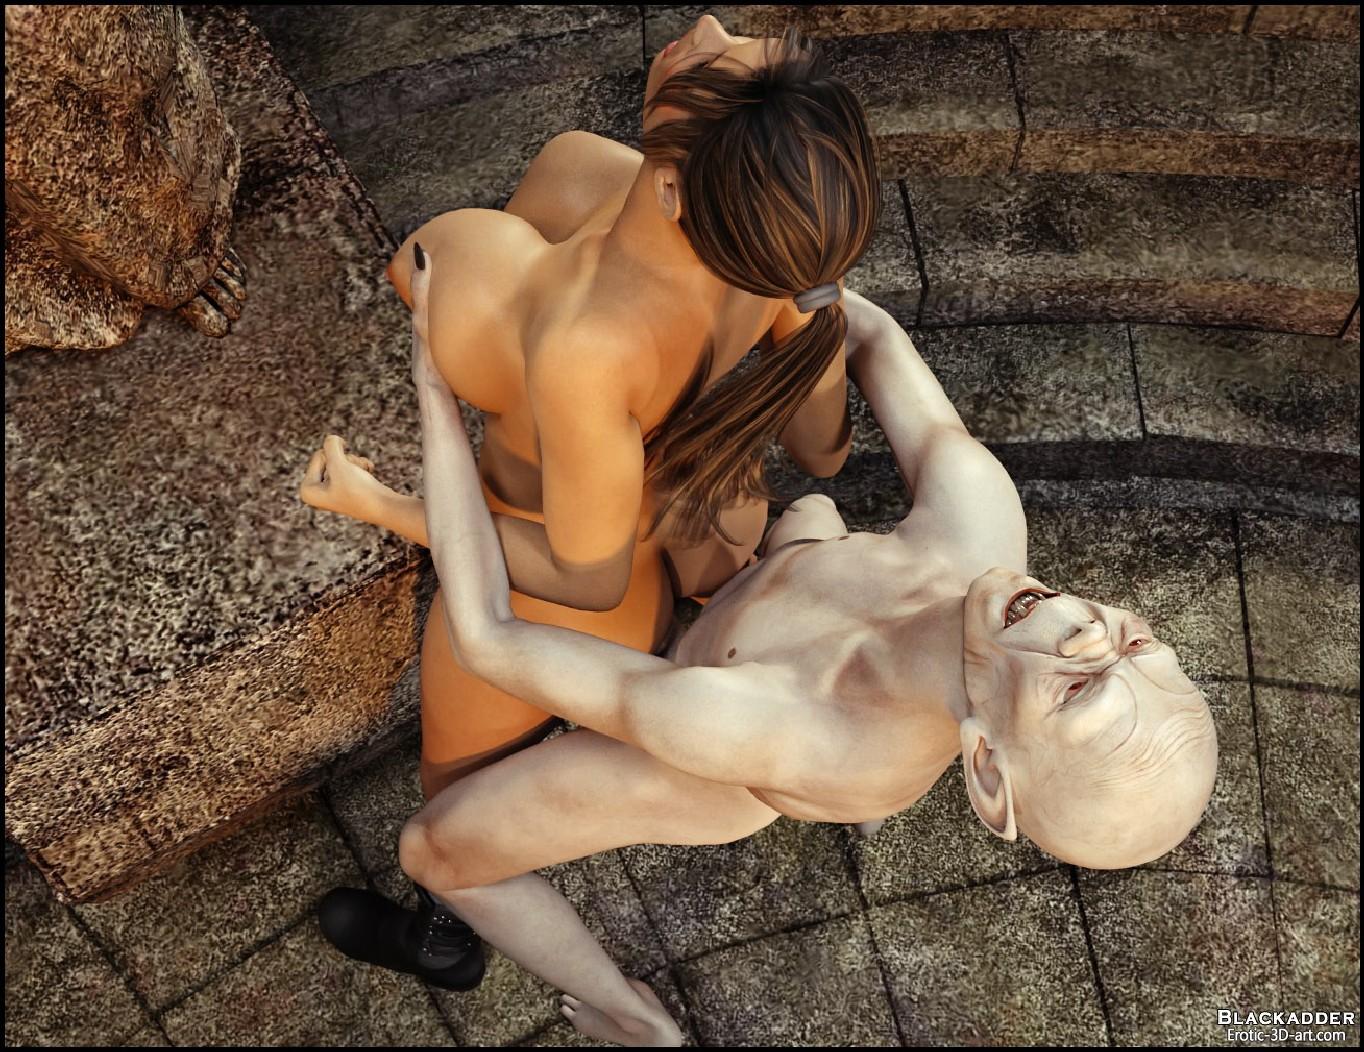 Fantasy teen pic sex clip